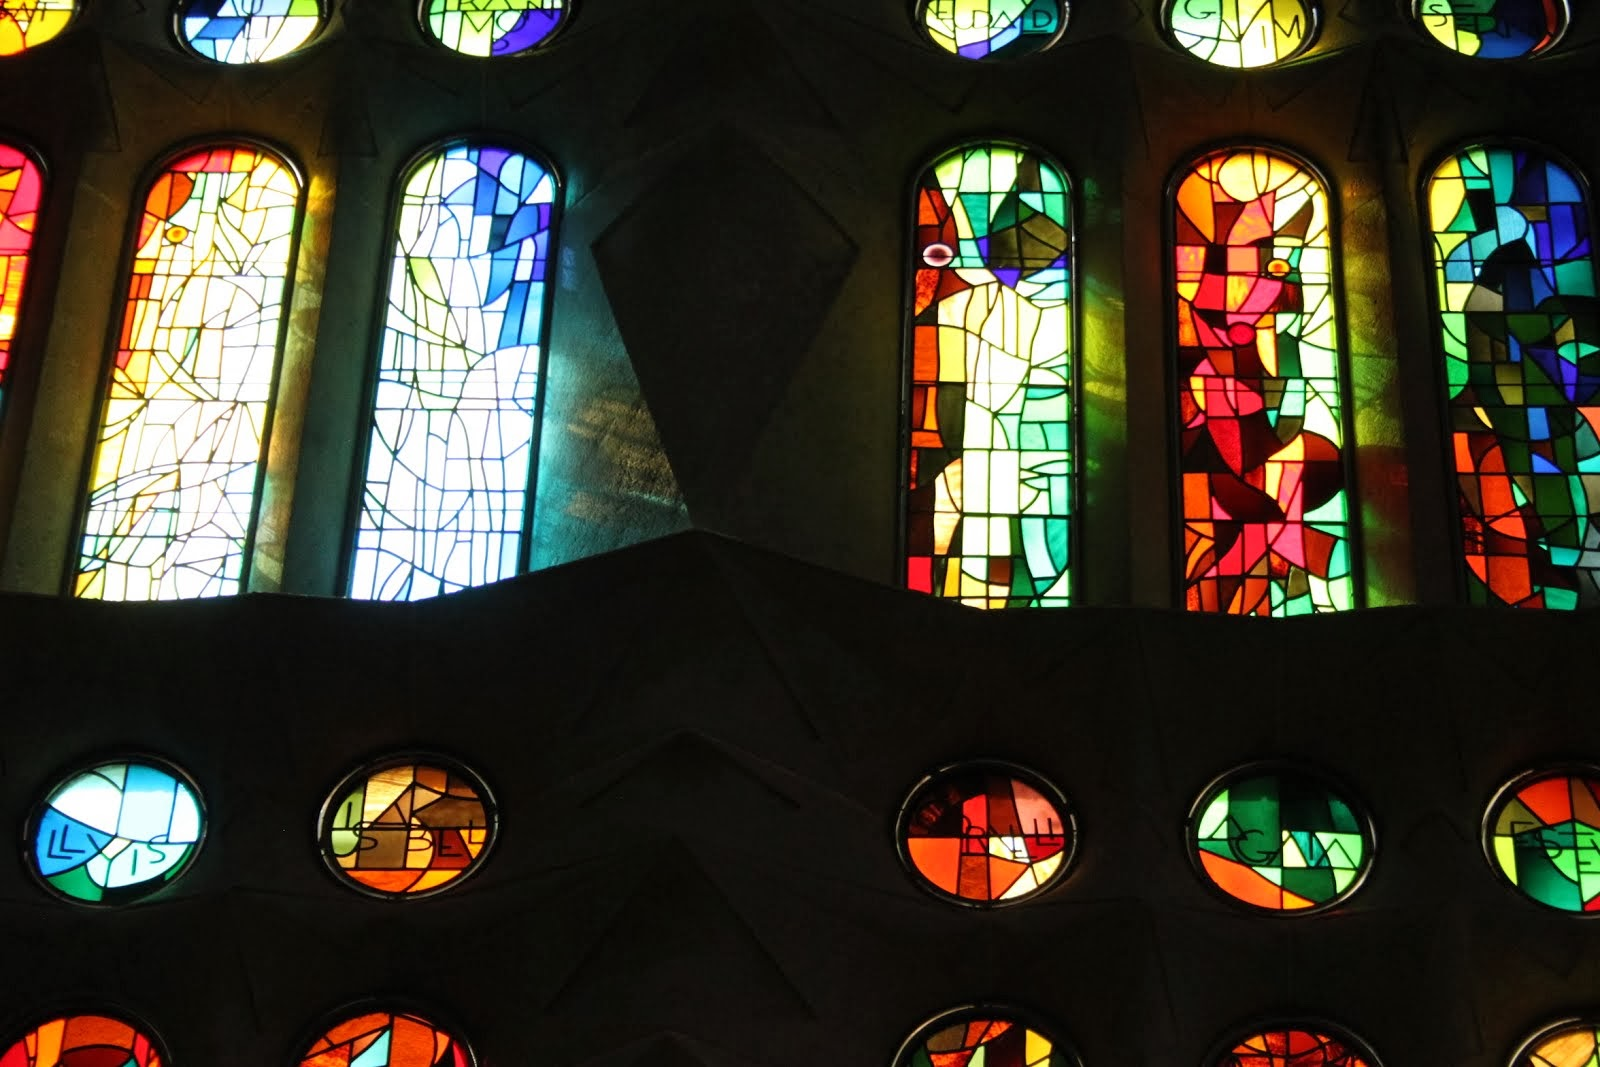 Sagrada, Barcelona